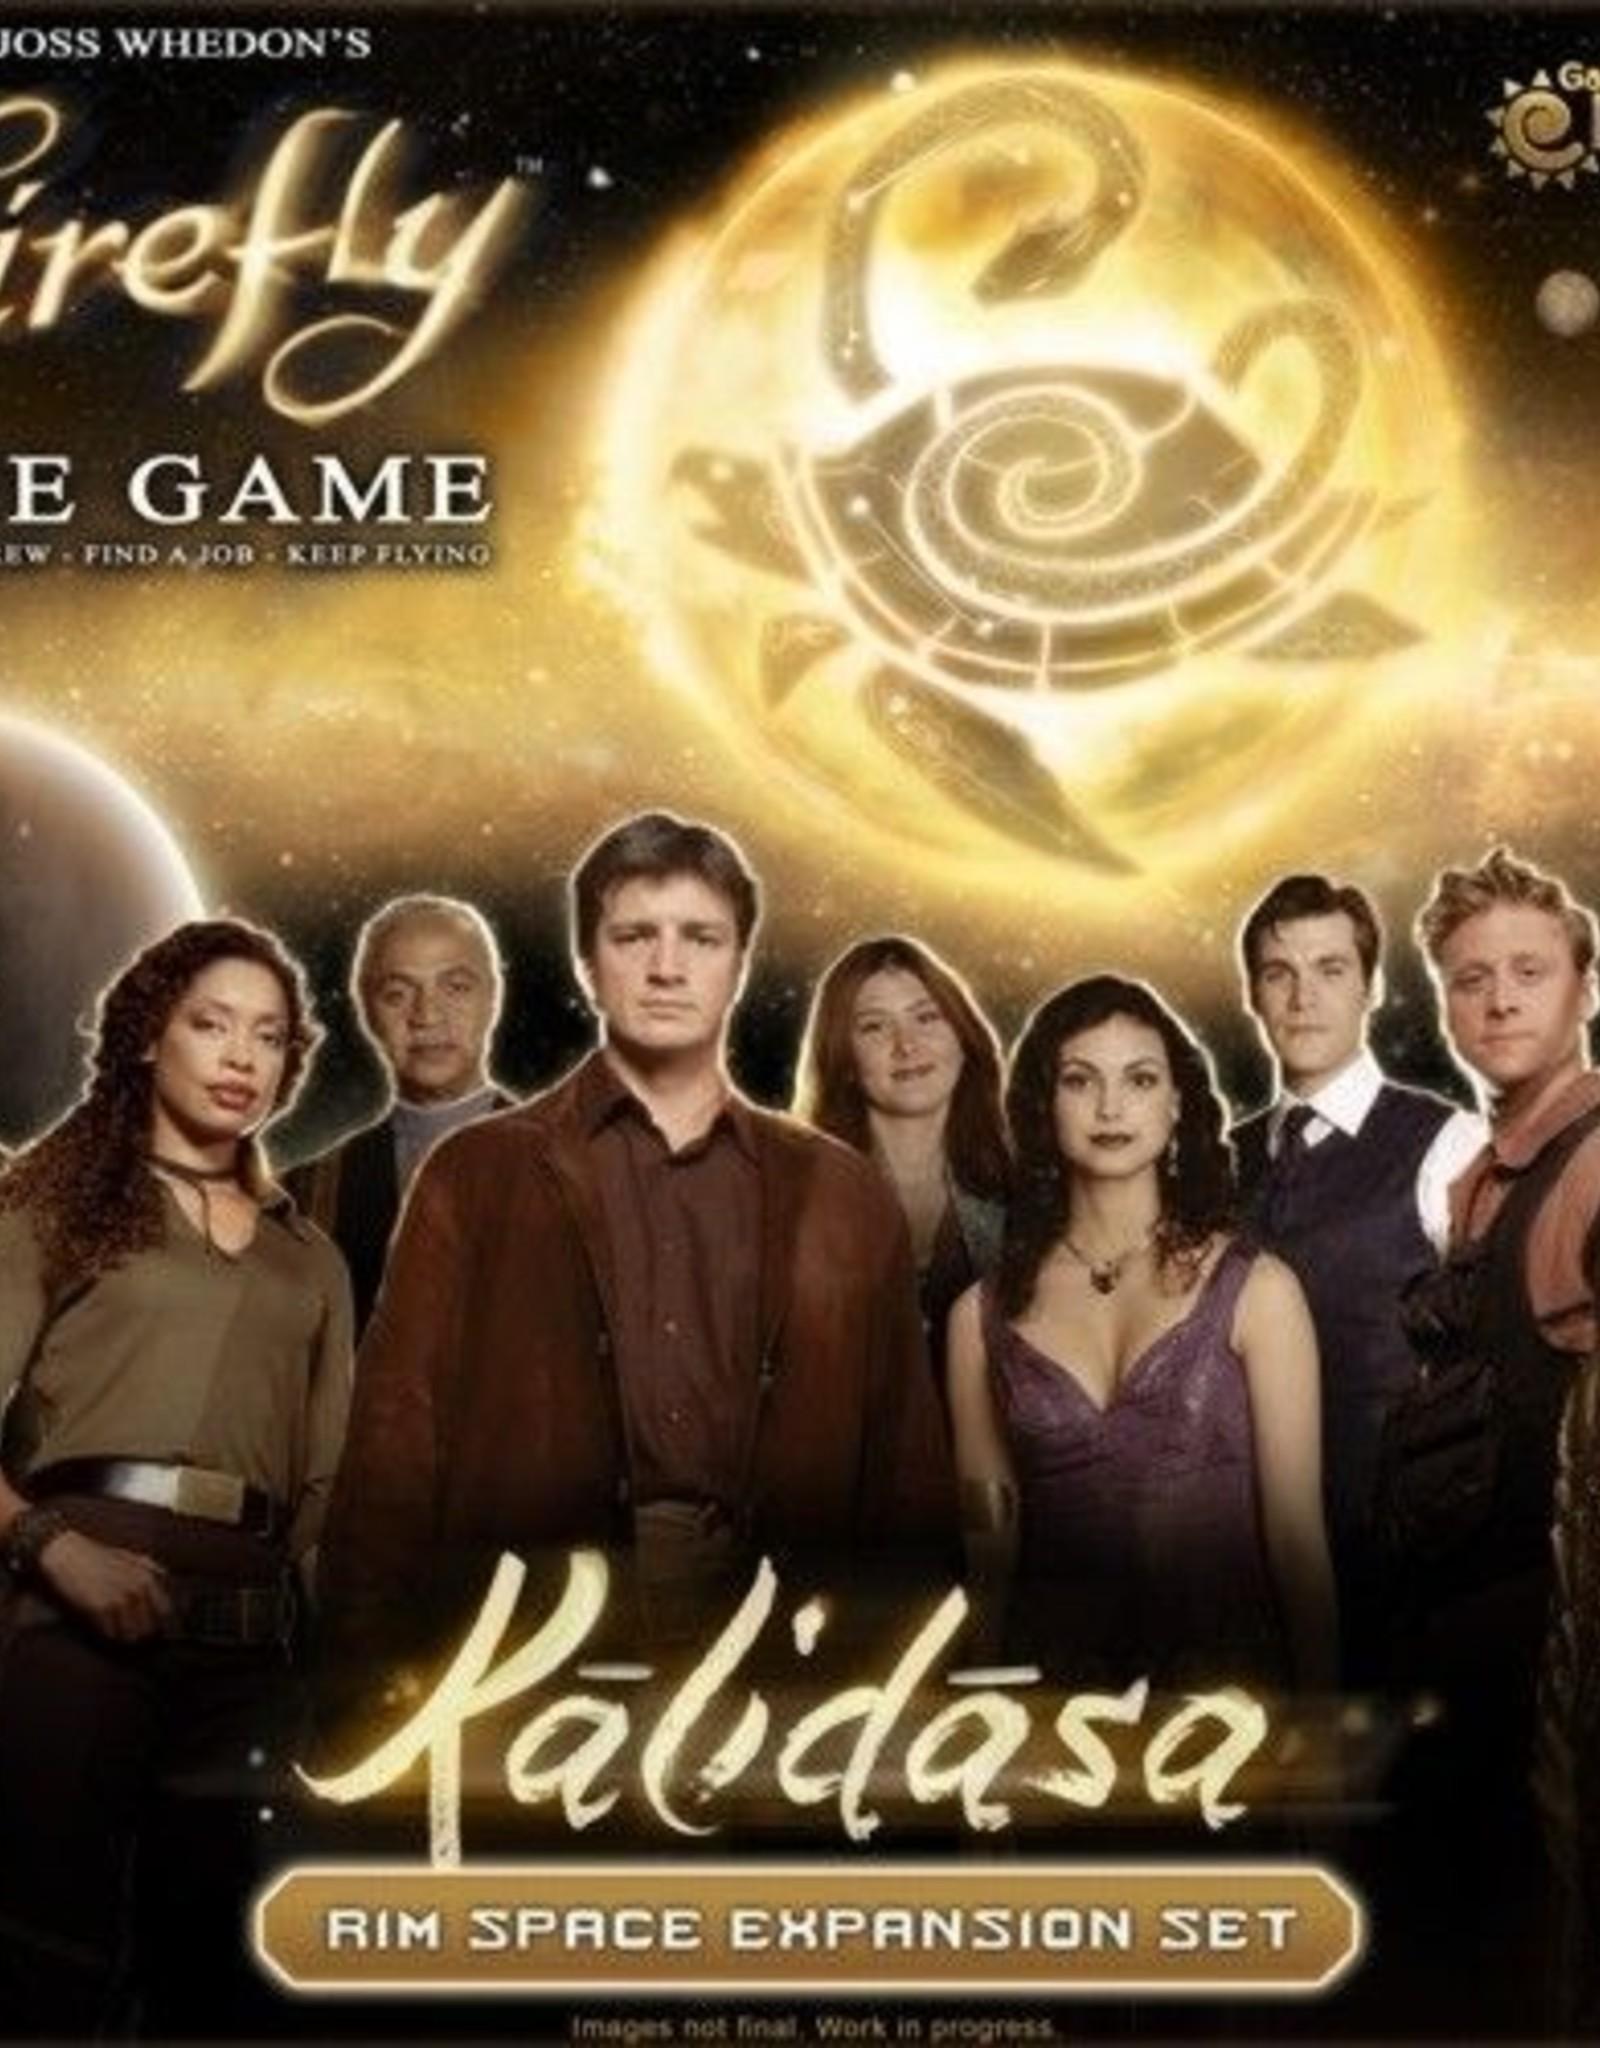 Gale Force 9 Firefly Kalidasa Expansion Set